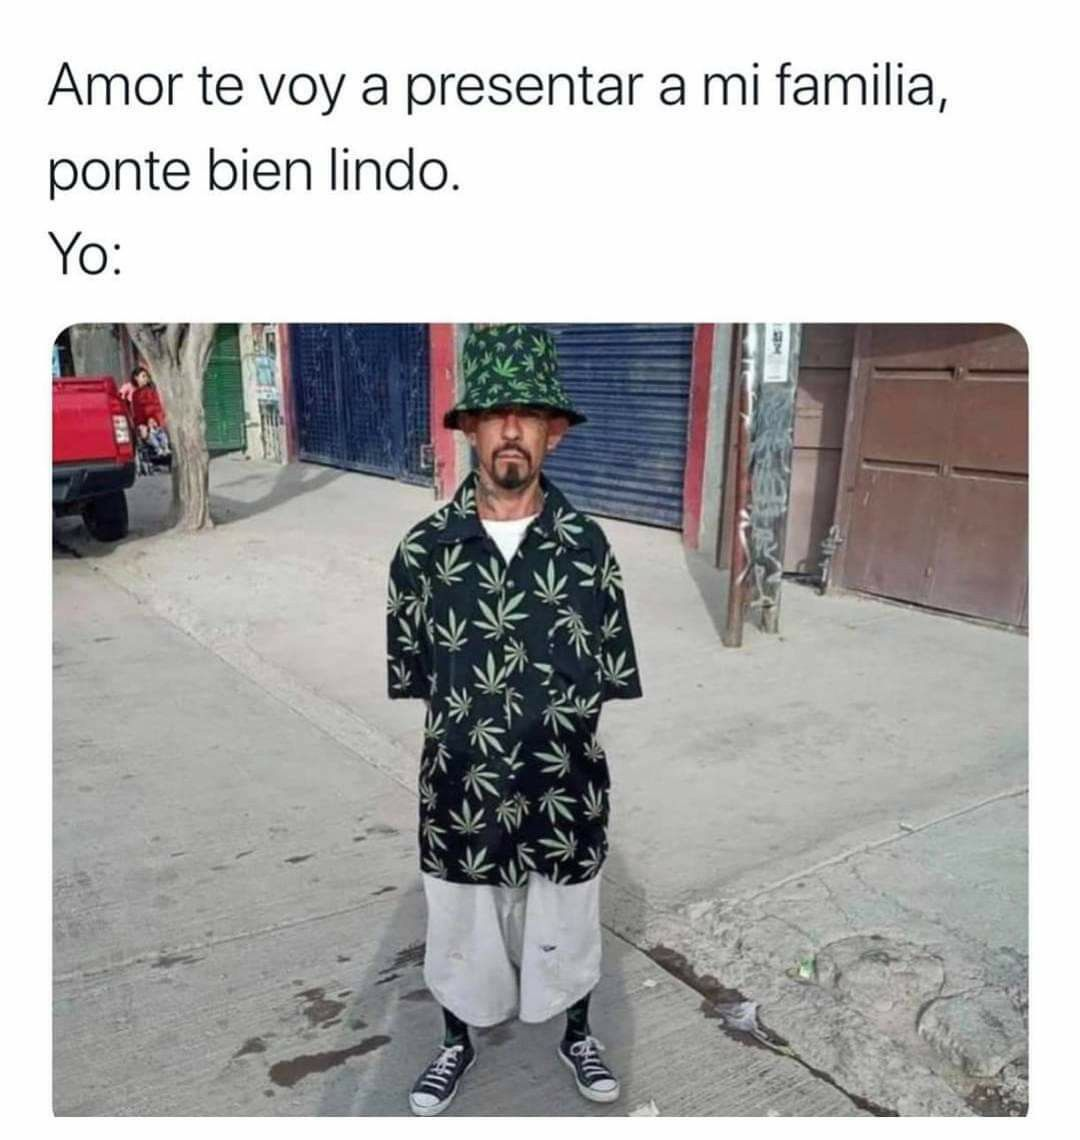 Meme En Espanol Instagram Instagram Photo Photo And Video